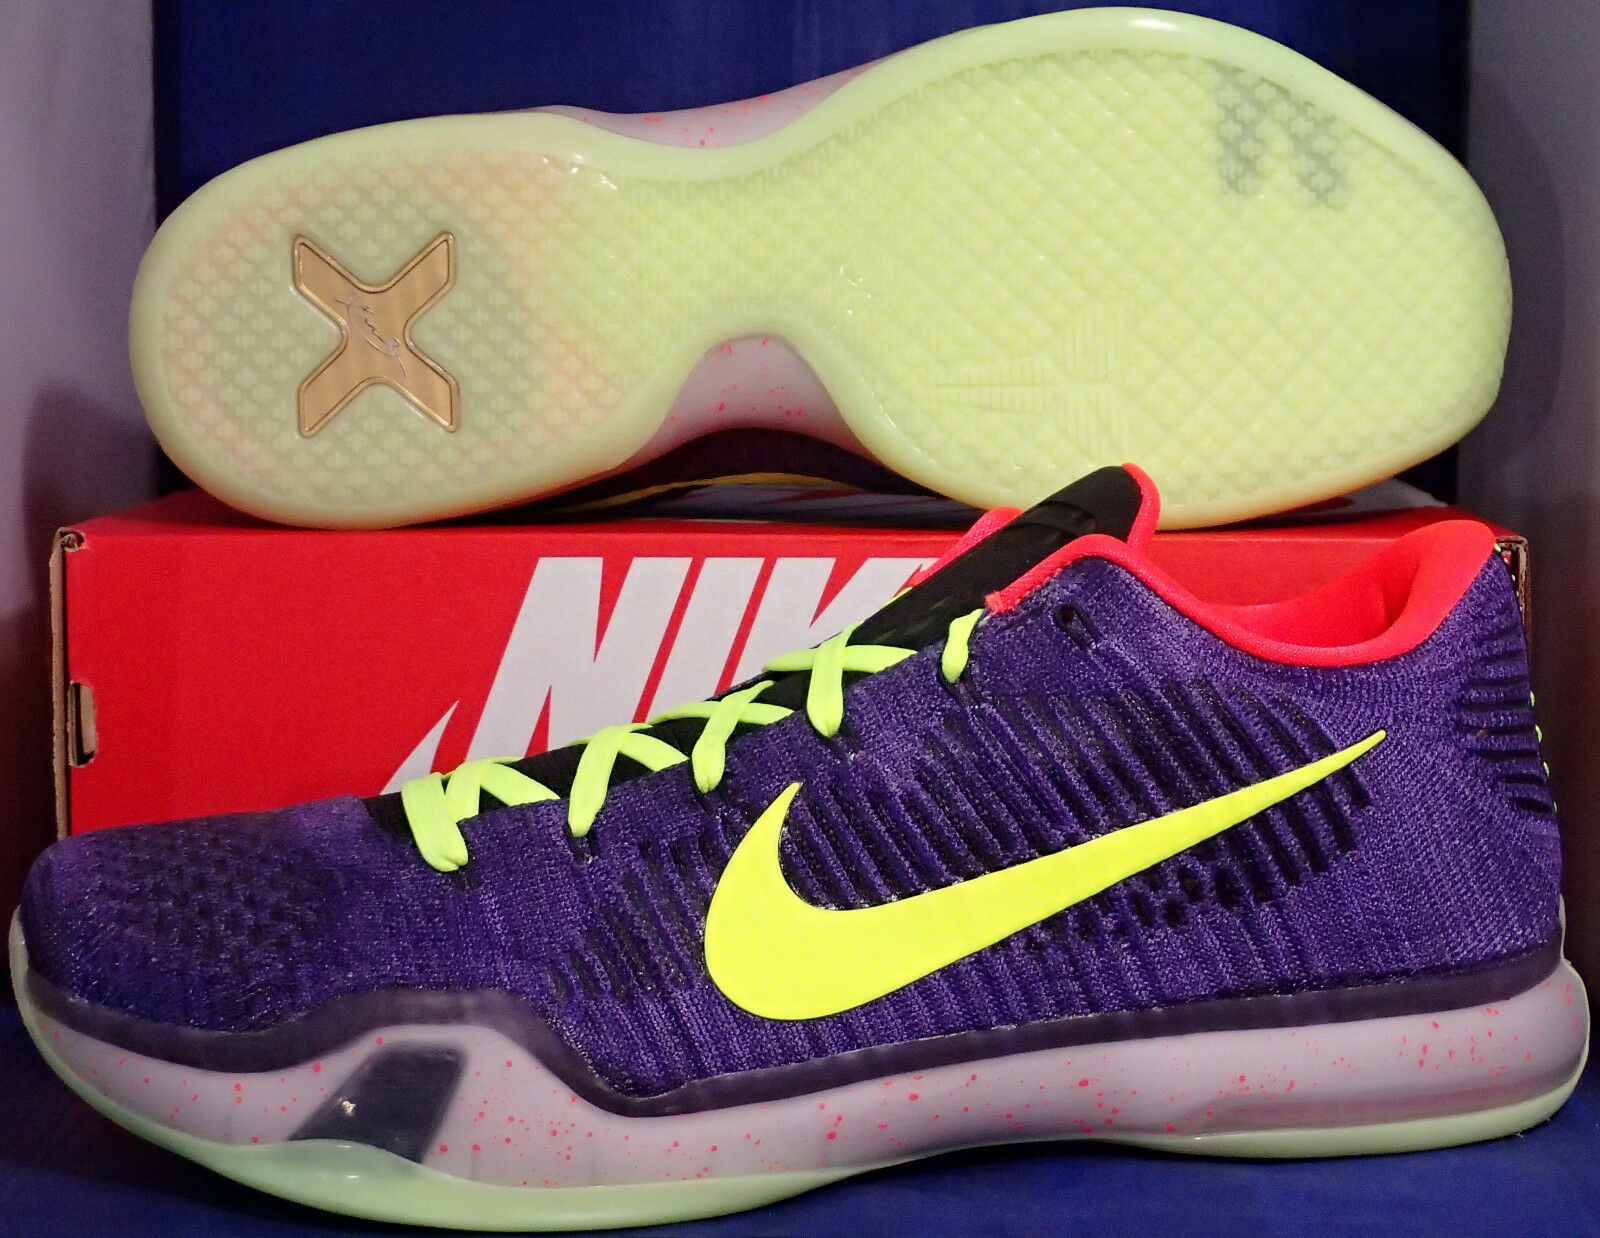 Nike Kobe X 10 Elite Low Flyknit iD Court Purple Volt SZ 14 ( 802817-991 )